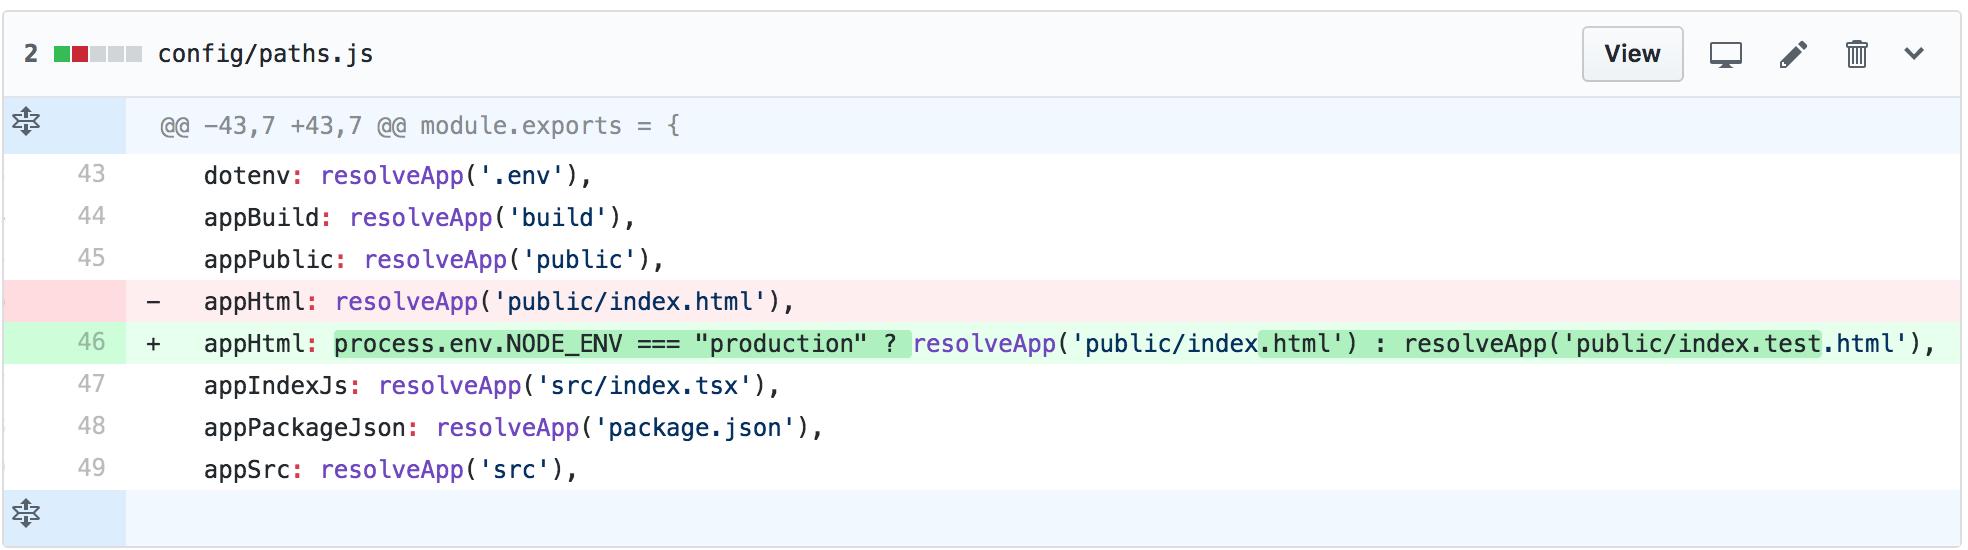 「path.js」create-react-appでenvroments value(環境変数)によってnoindex,noflollowなどをmetaタグ設定する方法